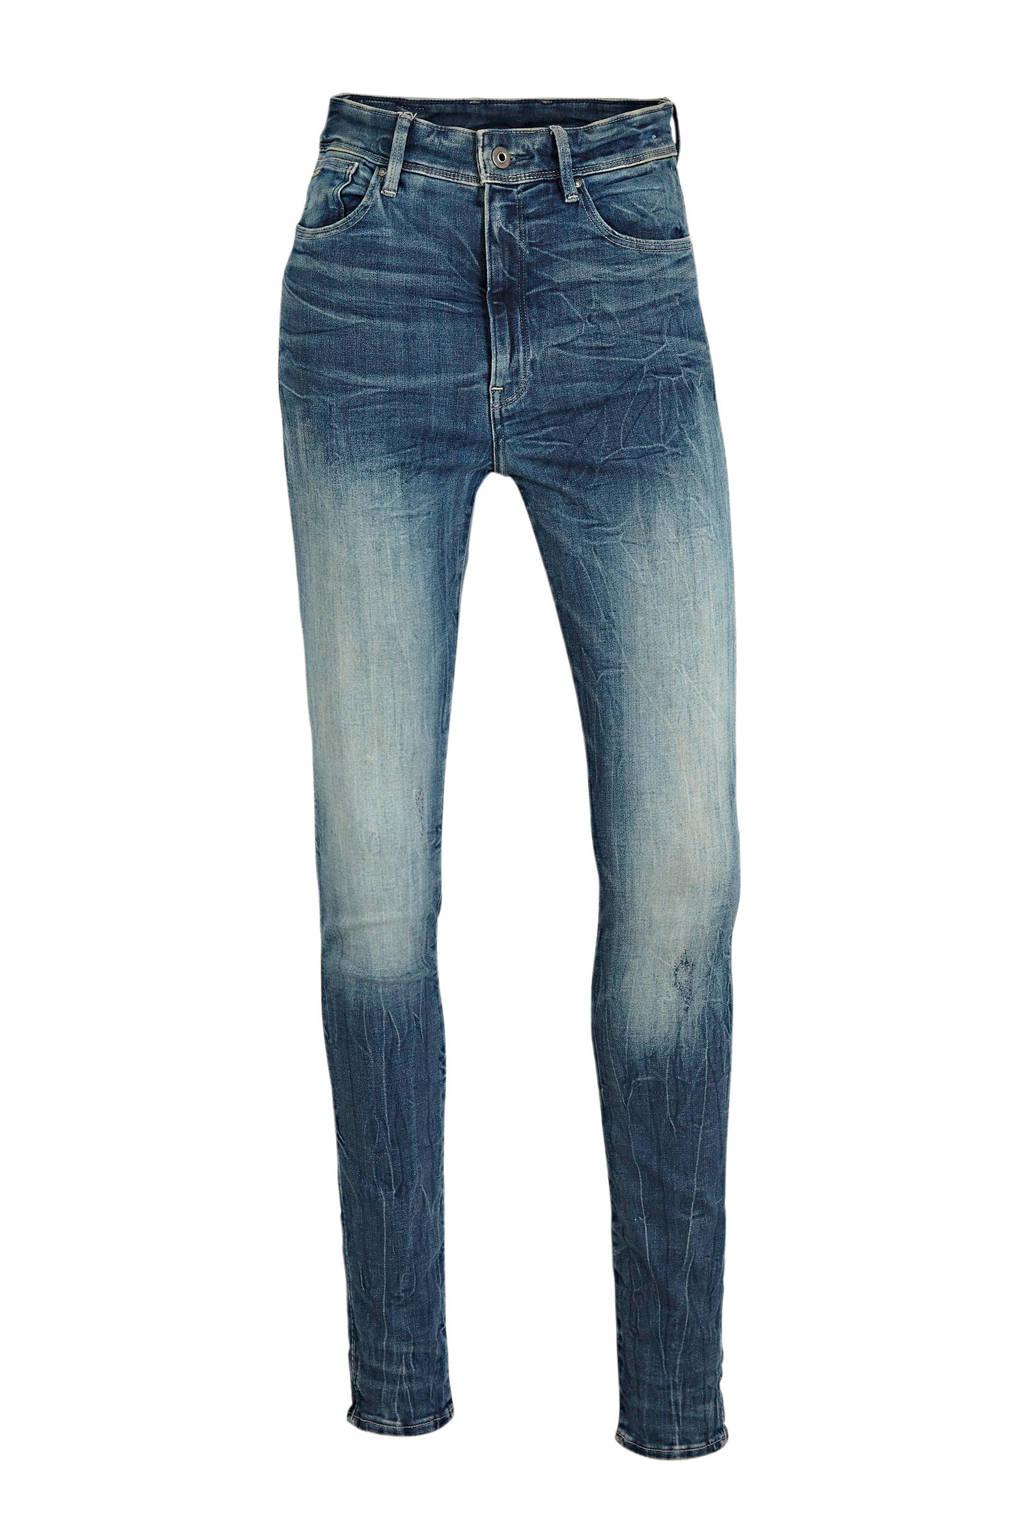 G-Star RAW high waist skinny jeans Kafey antic faded baum blue